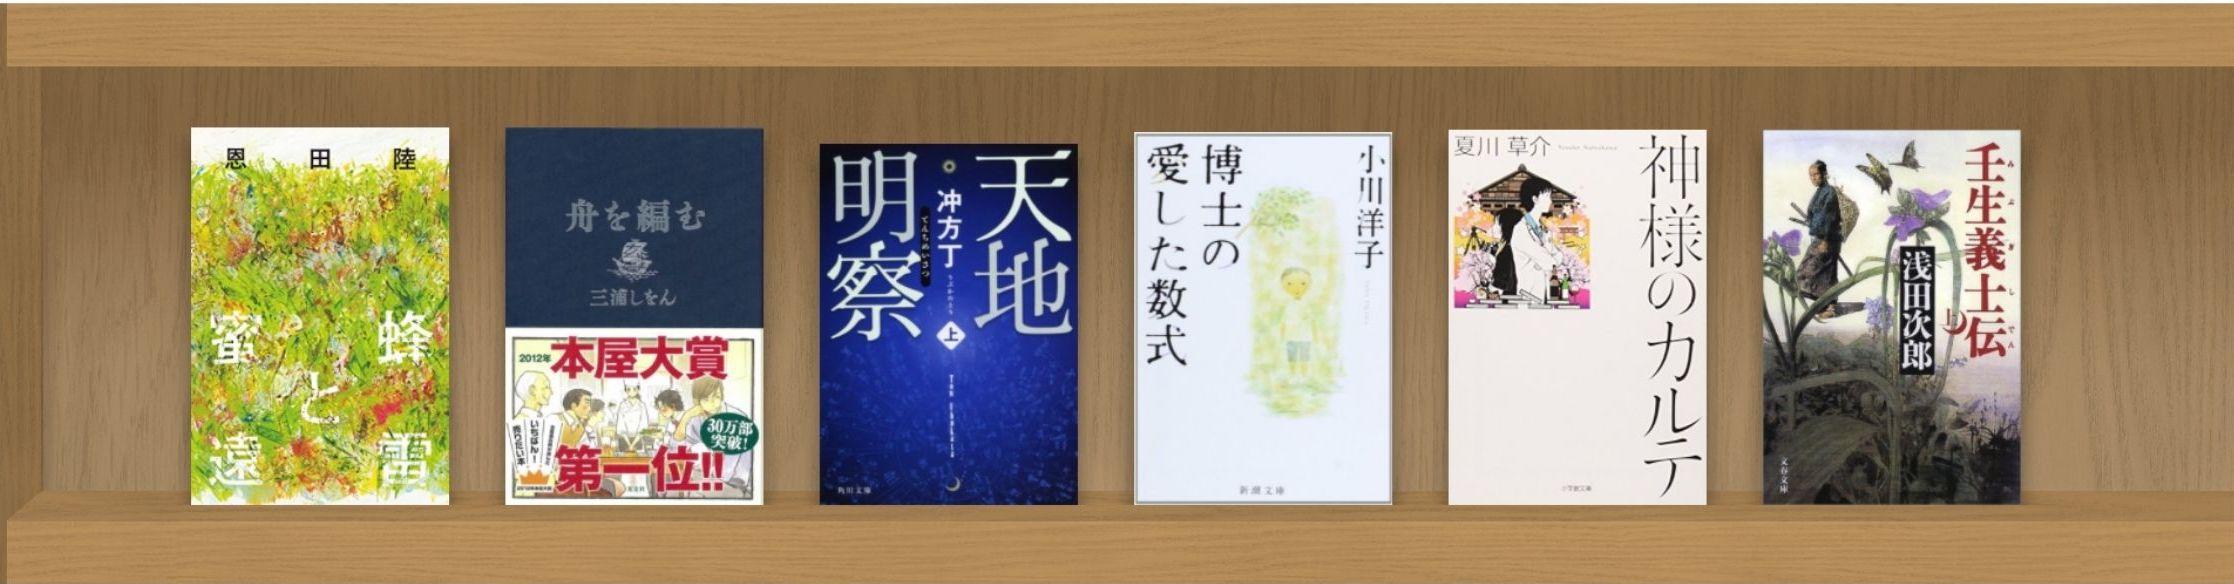 profile小説